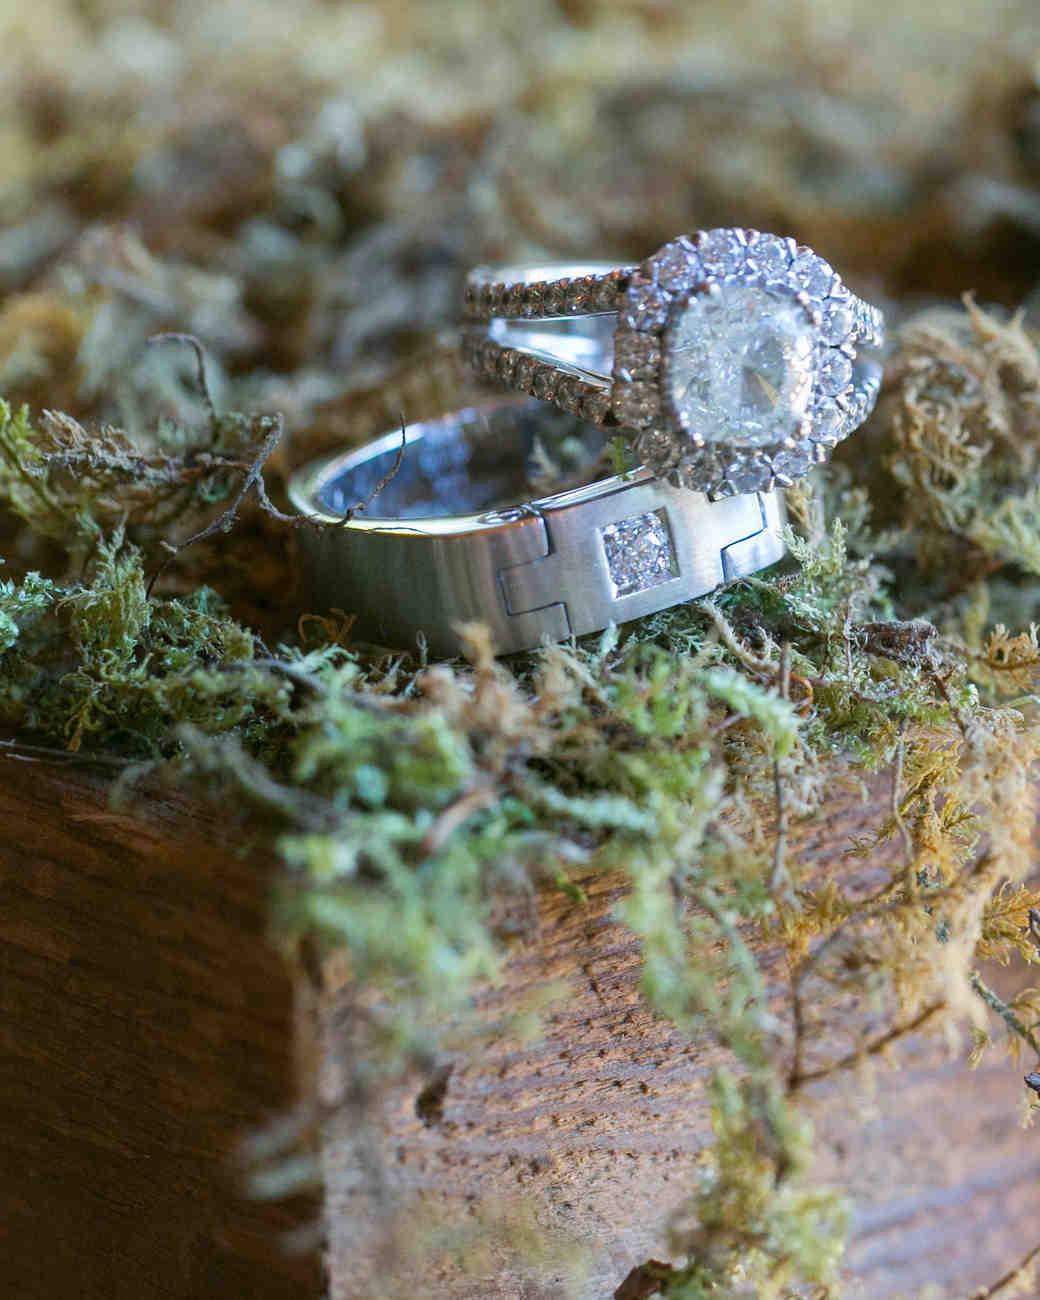 briana-adam-wedding-rings-0156-s112471-1215.jpg